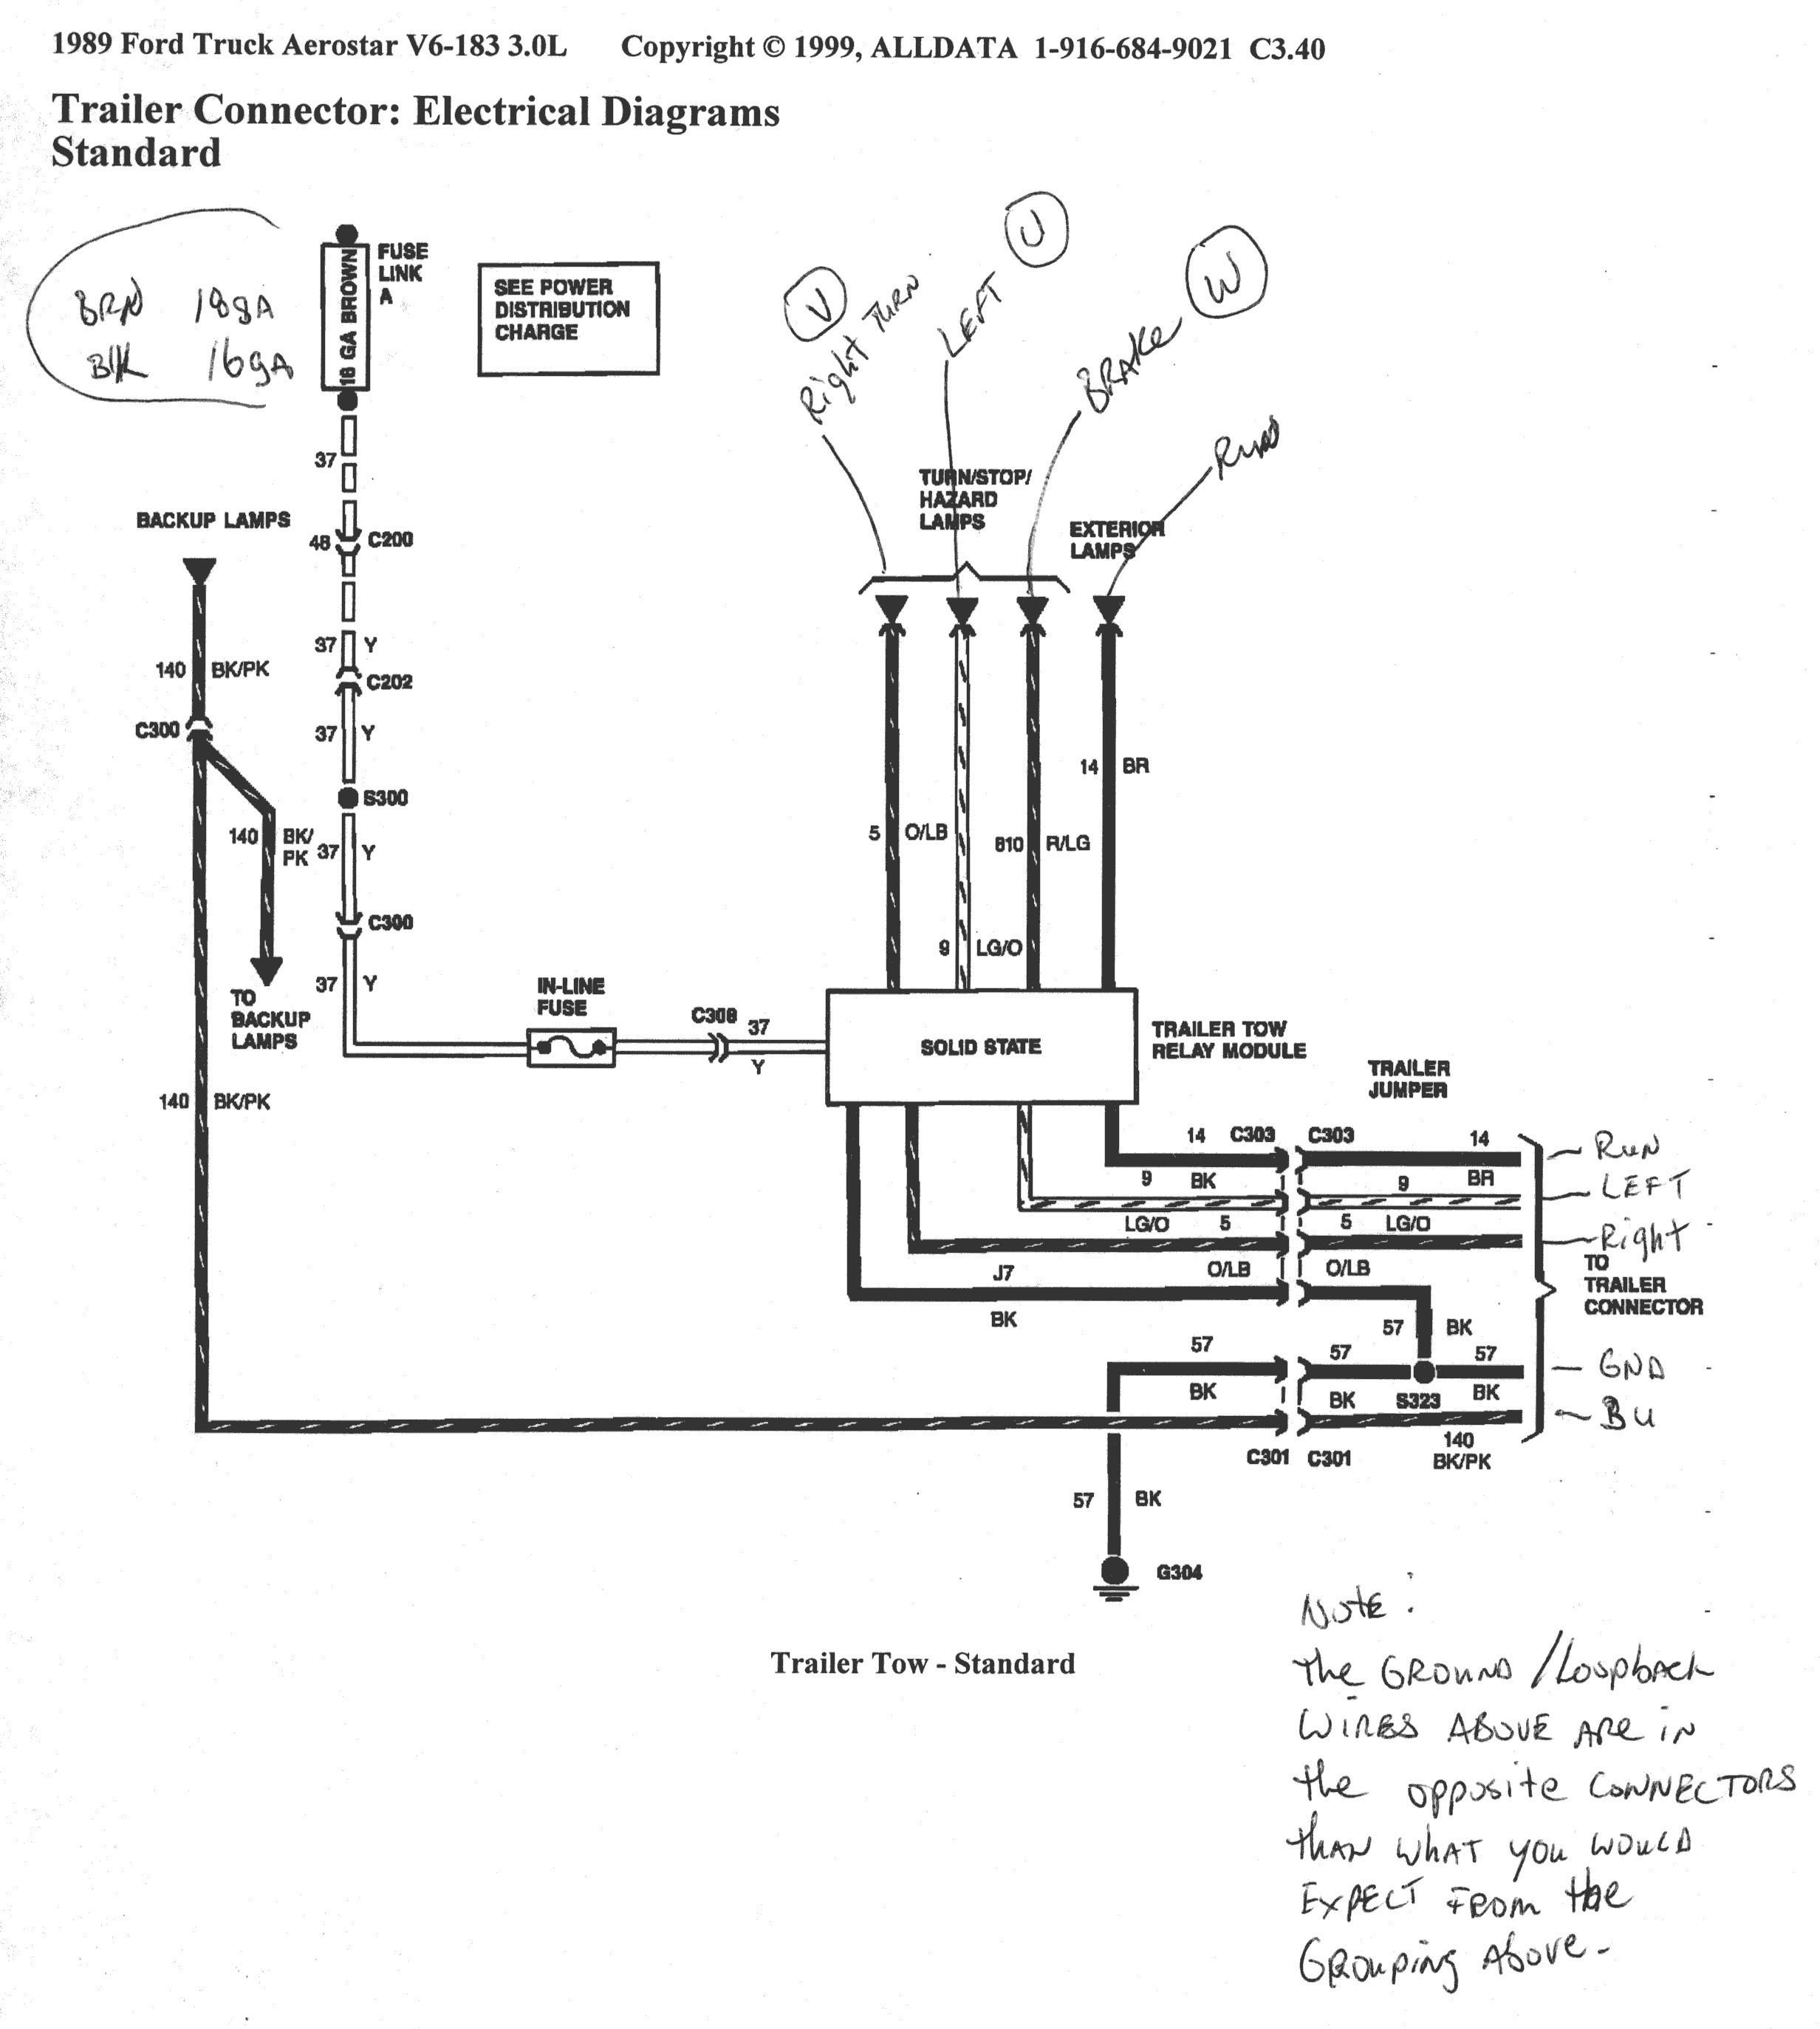 Engine Block Diagram 2001 Mitsubishi Eclipse Wiring Diagram Reference Mitsubishi Trailer Of Engine Block Diagram